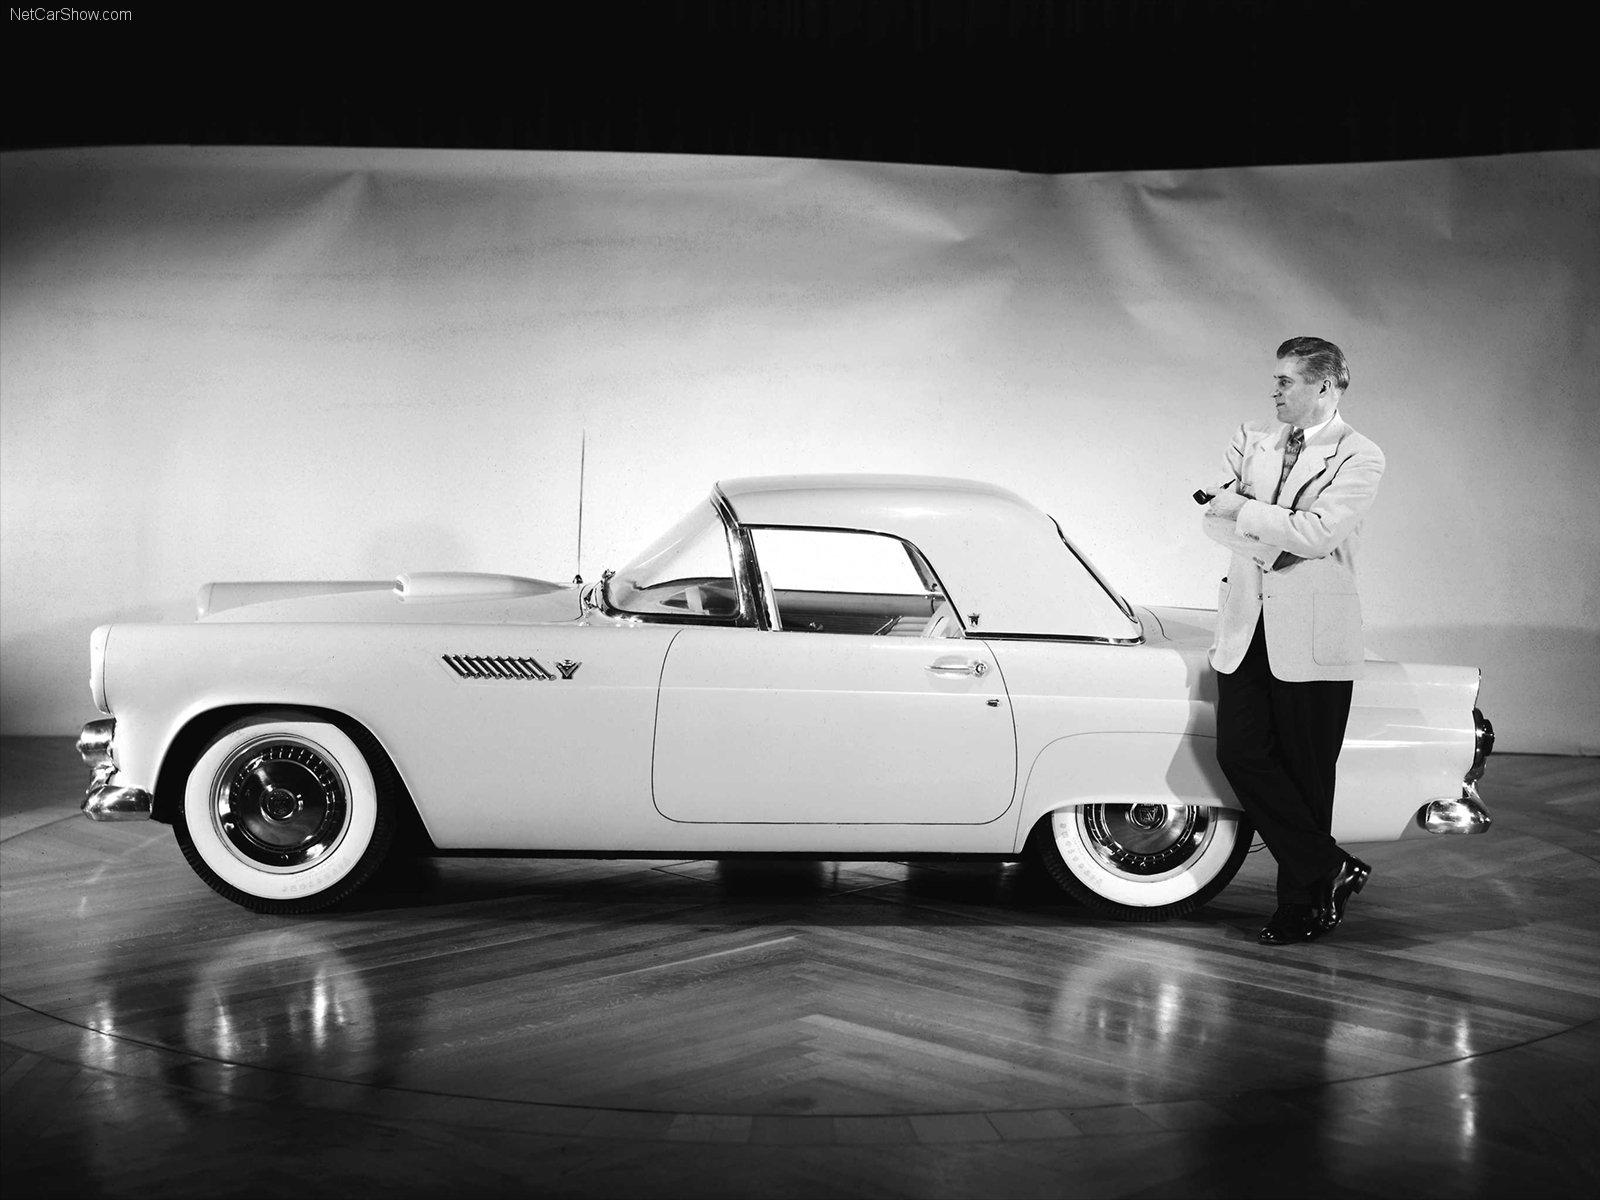 Ford-Thunderbird-1955-1600-04.jpg